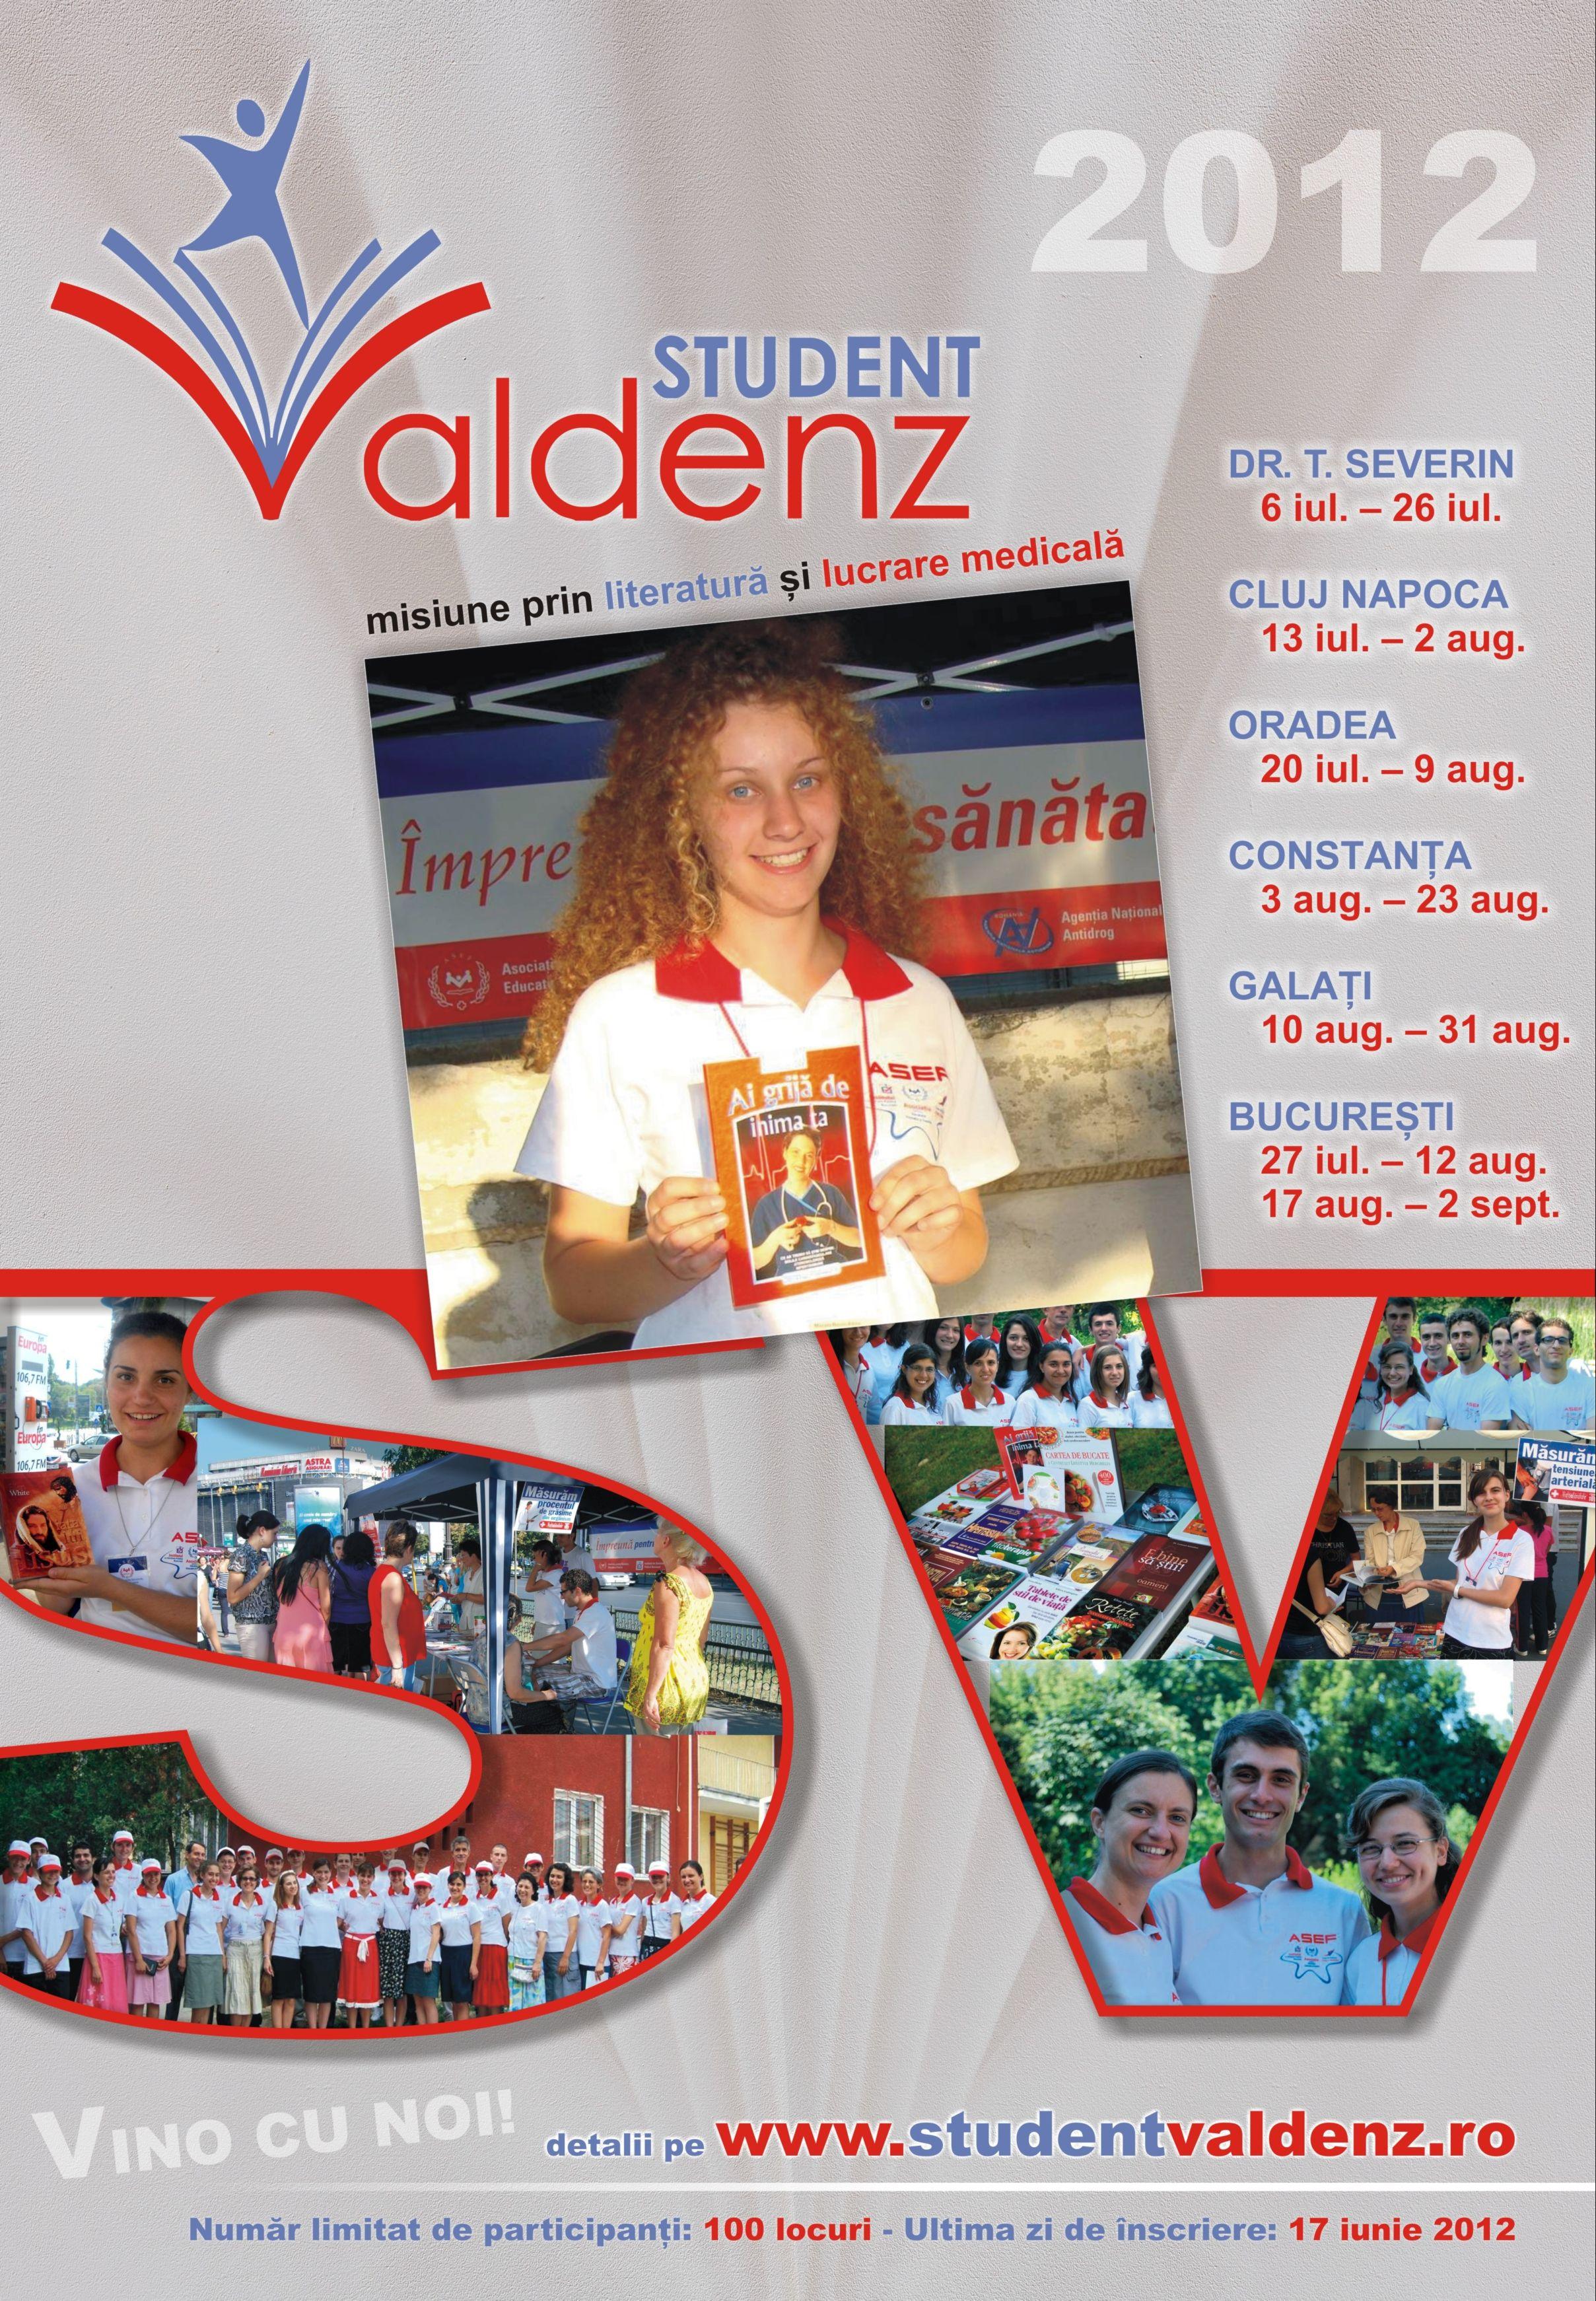 "Proiect misionar pentru tineri: ""STUDENT VALDENZ"", 2012"